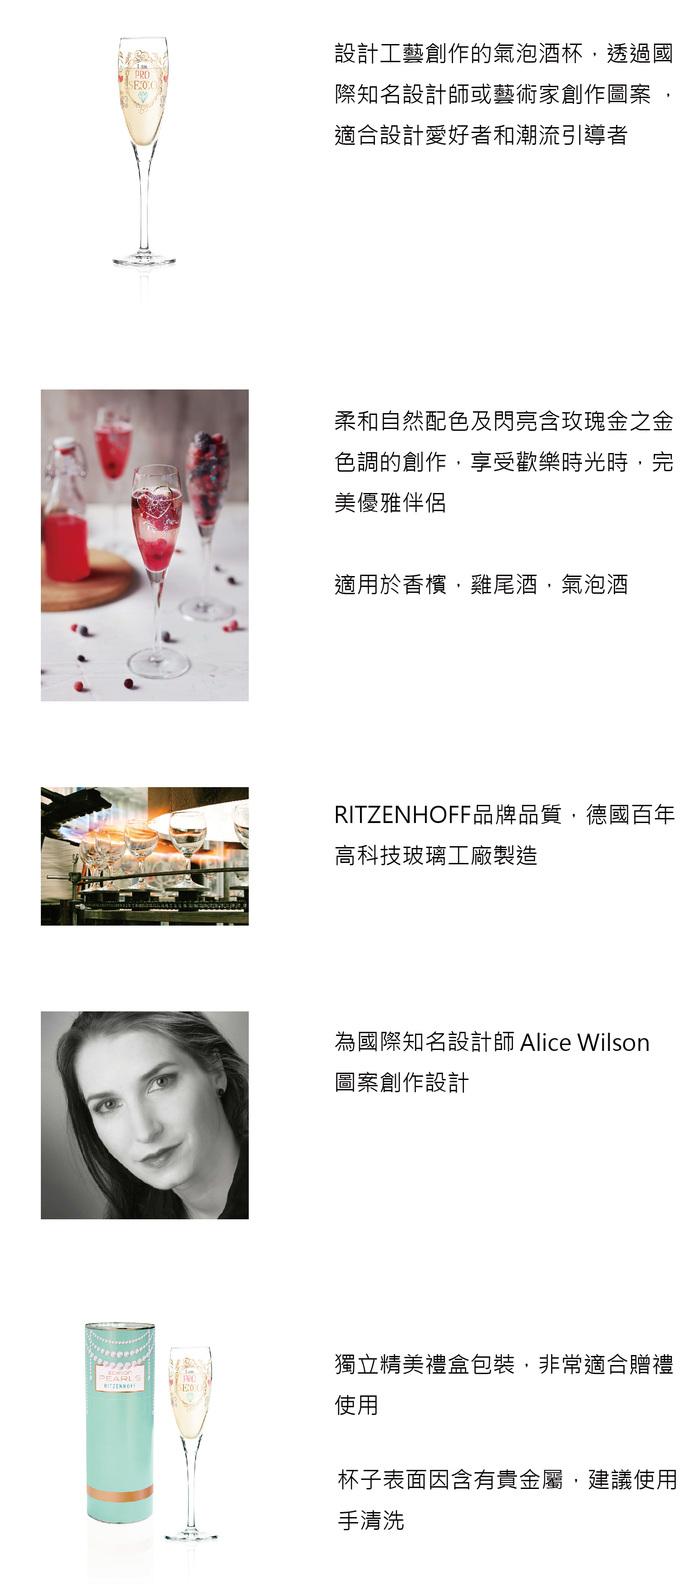 (複製)德國 RITZENHOFF  珍珠氣泡酒杯   PEARLS EDITION 夢幻女孩